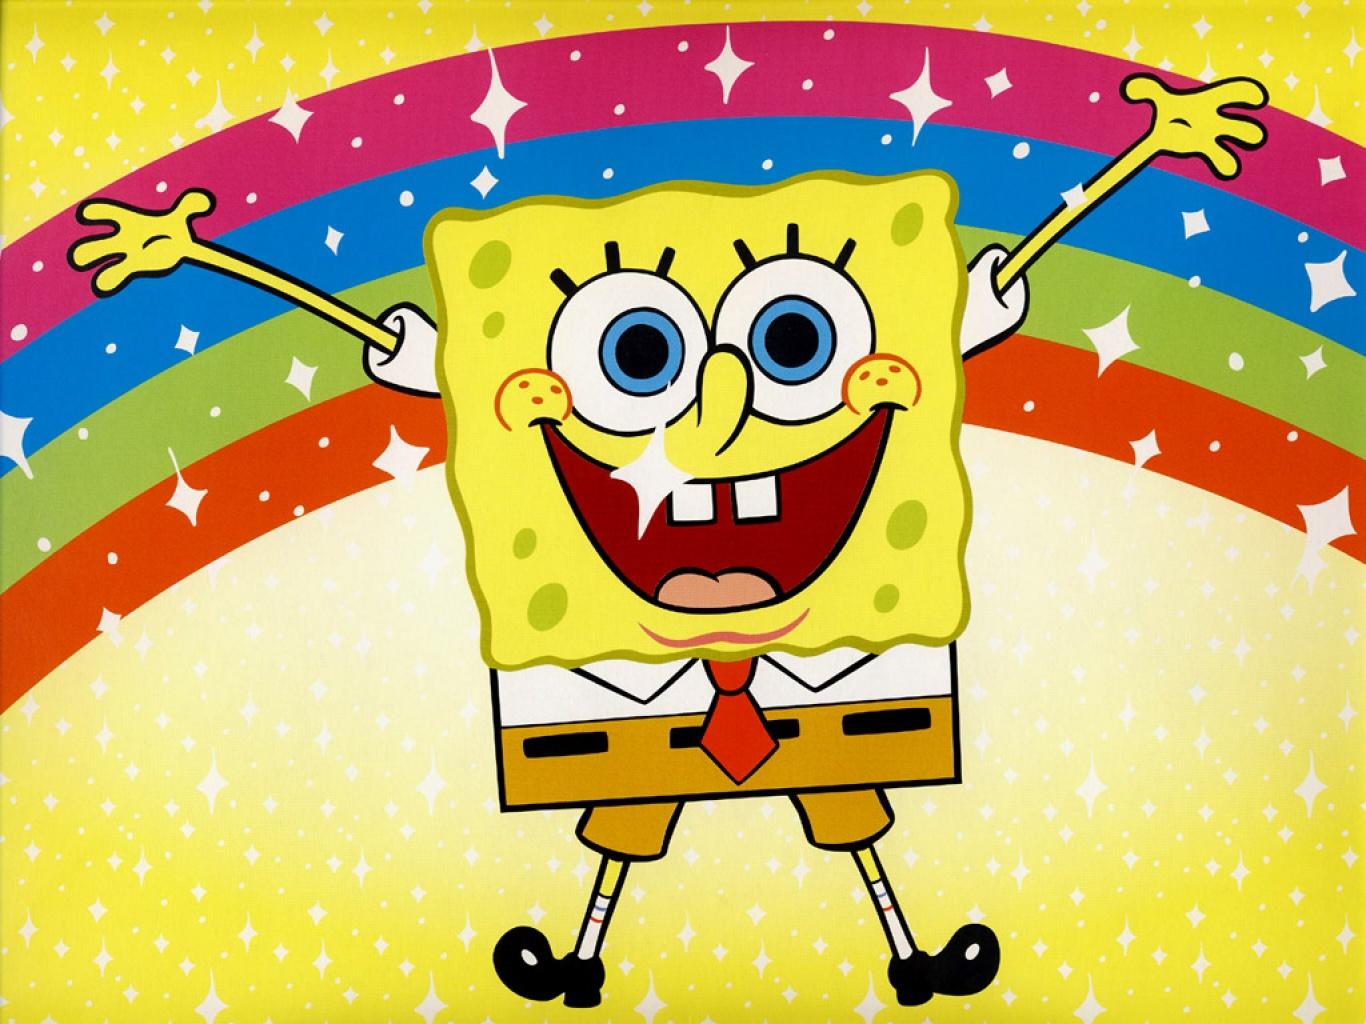 Free Download Spongebob Wallpaper Hd Background 1366x1024 For Your Desktop Mobile Tablet Explore 75 Spongebob Computer Backgrounds Spongebob Computer Backgrounds Spongebob Wallpapers For Computer Spongebob Wallpaper For Your Computer